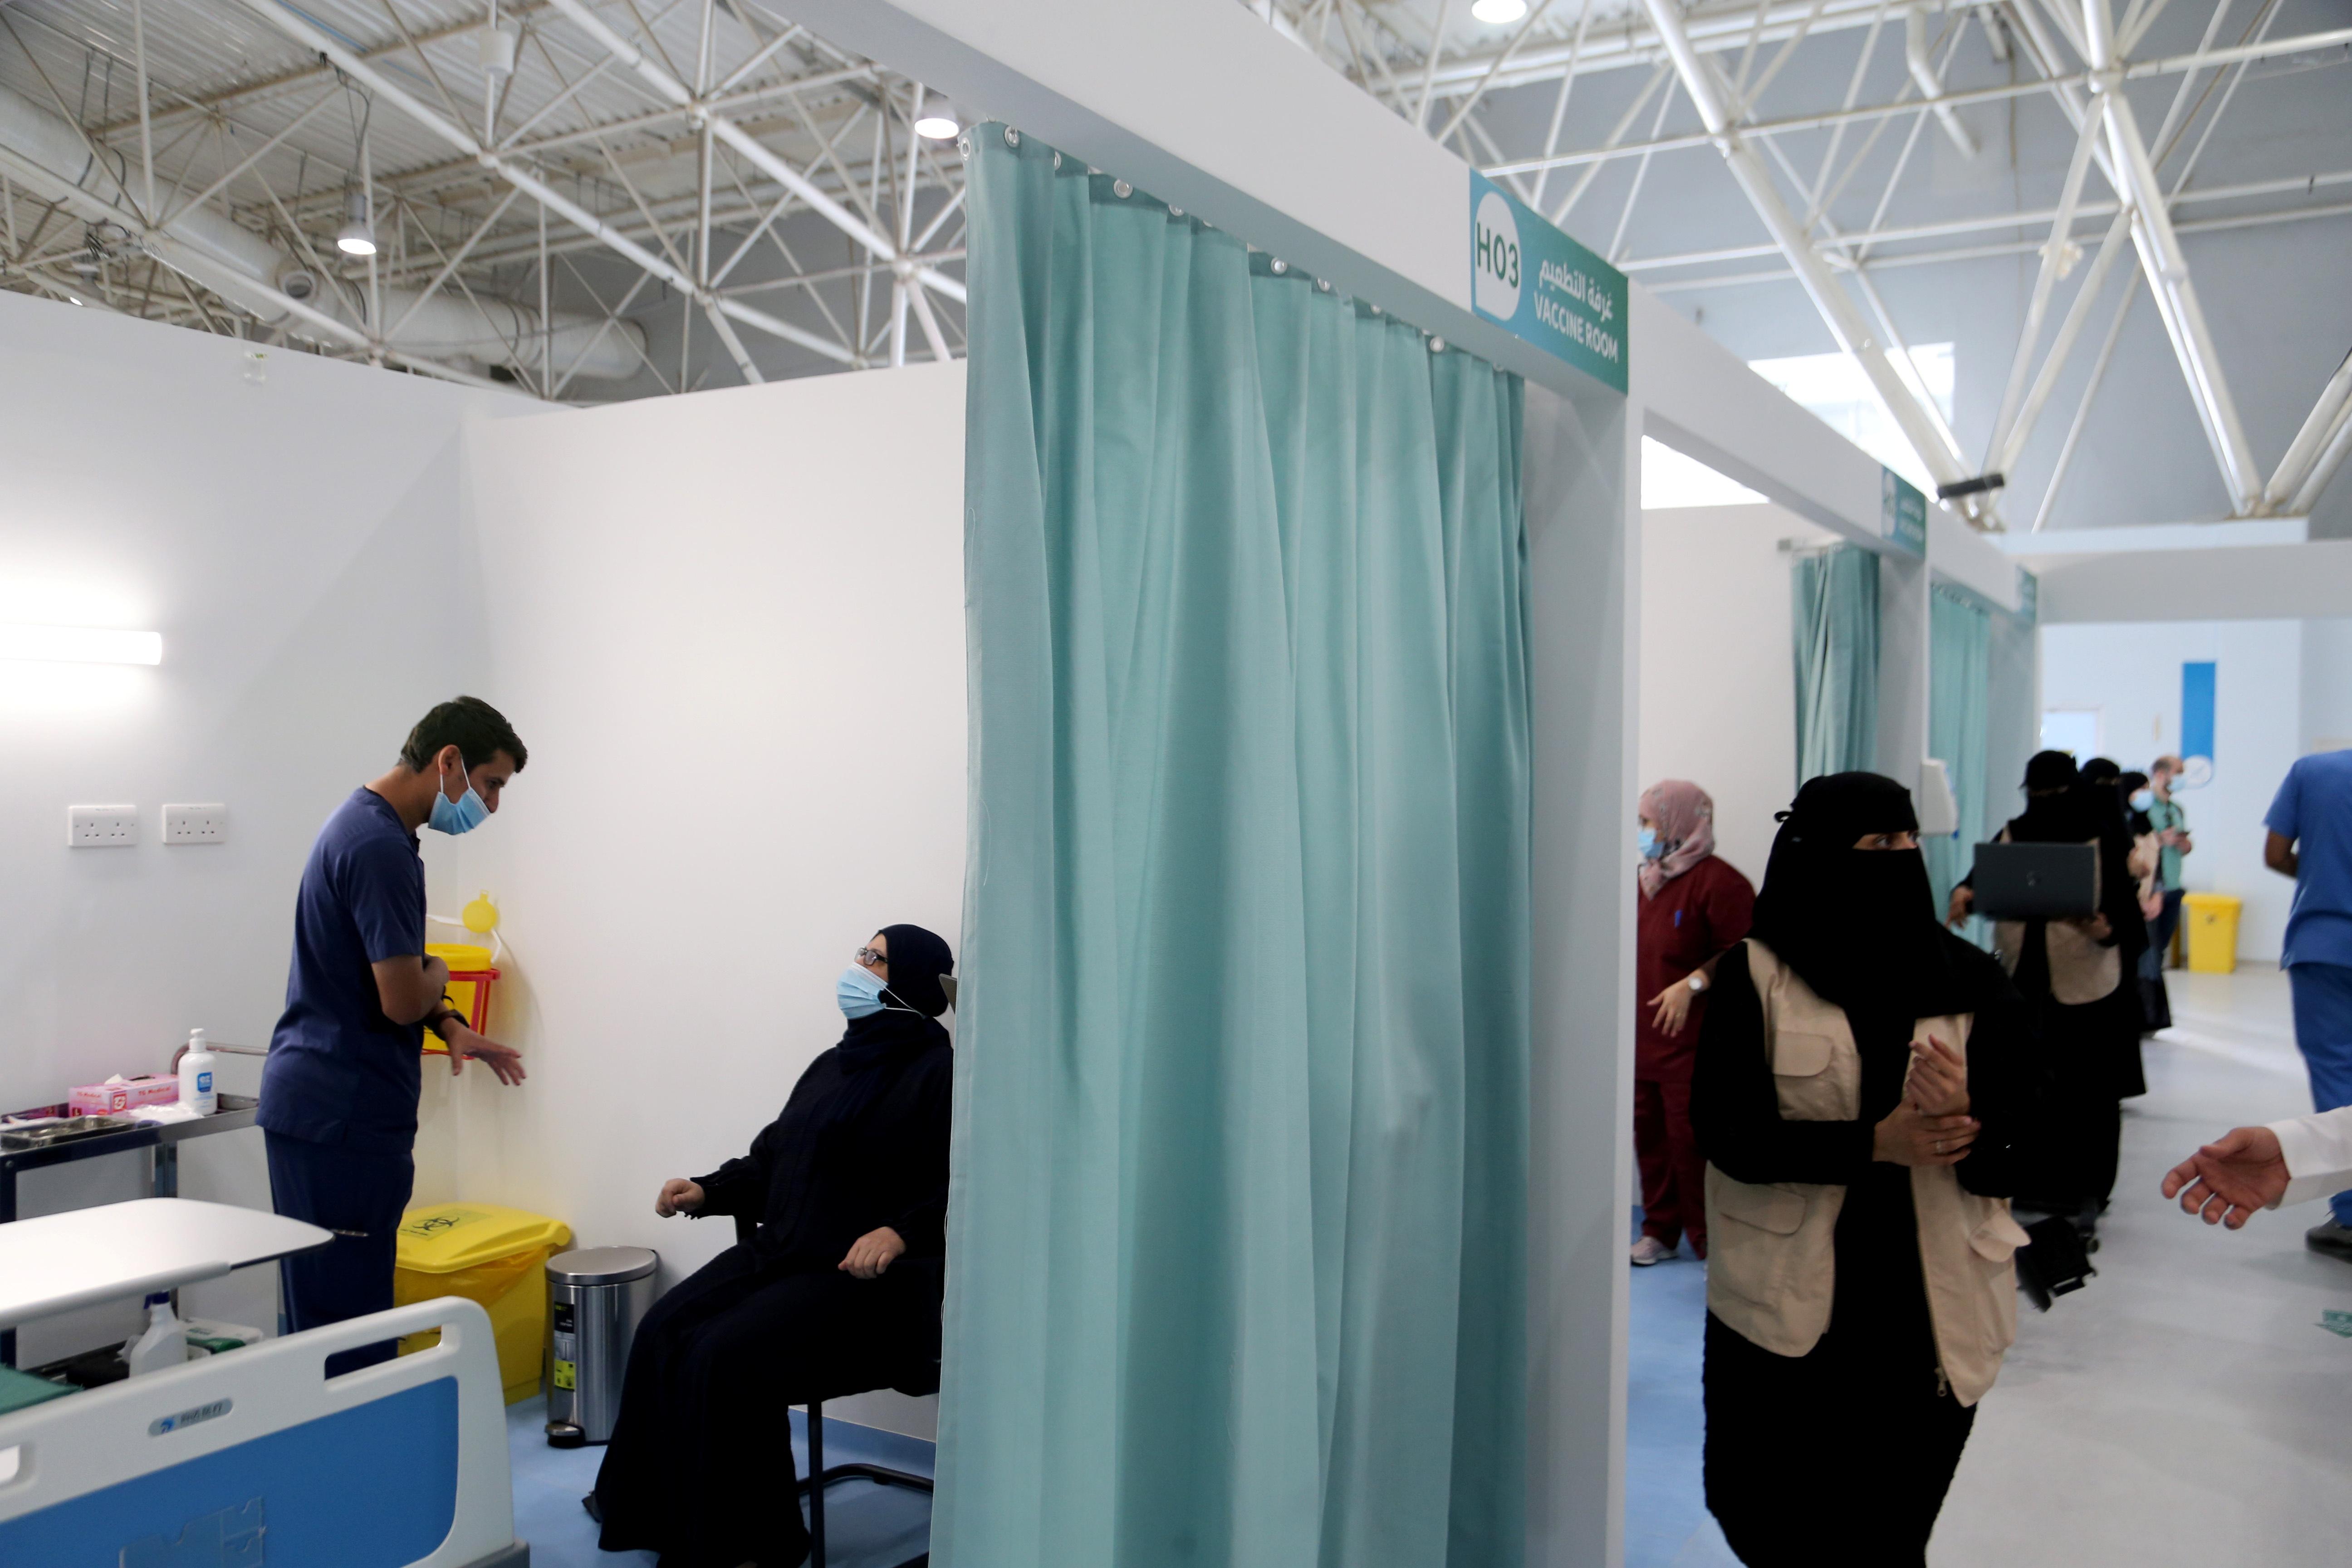 A Saudi woman waits to get a dose of a coronavirus disease (COVID-19) vaccine, in Riyadh, Saudi Arabia December 17, 2020. REUTERS/Ahmed Yosri